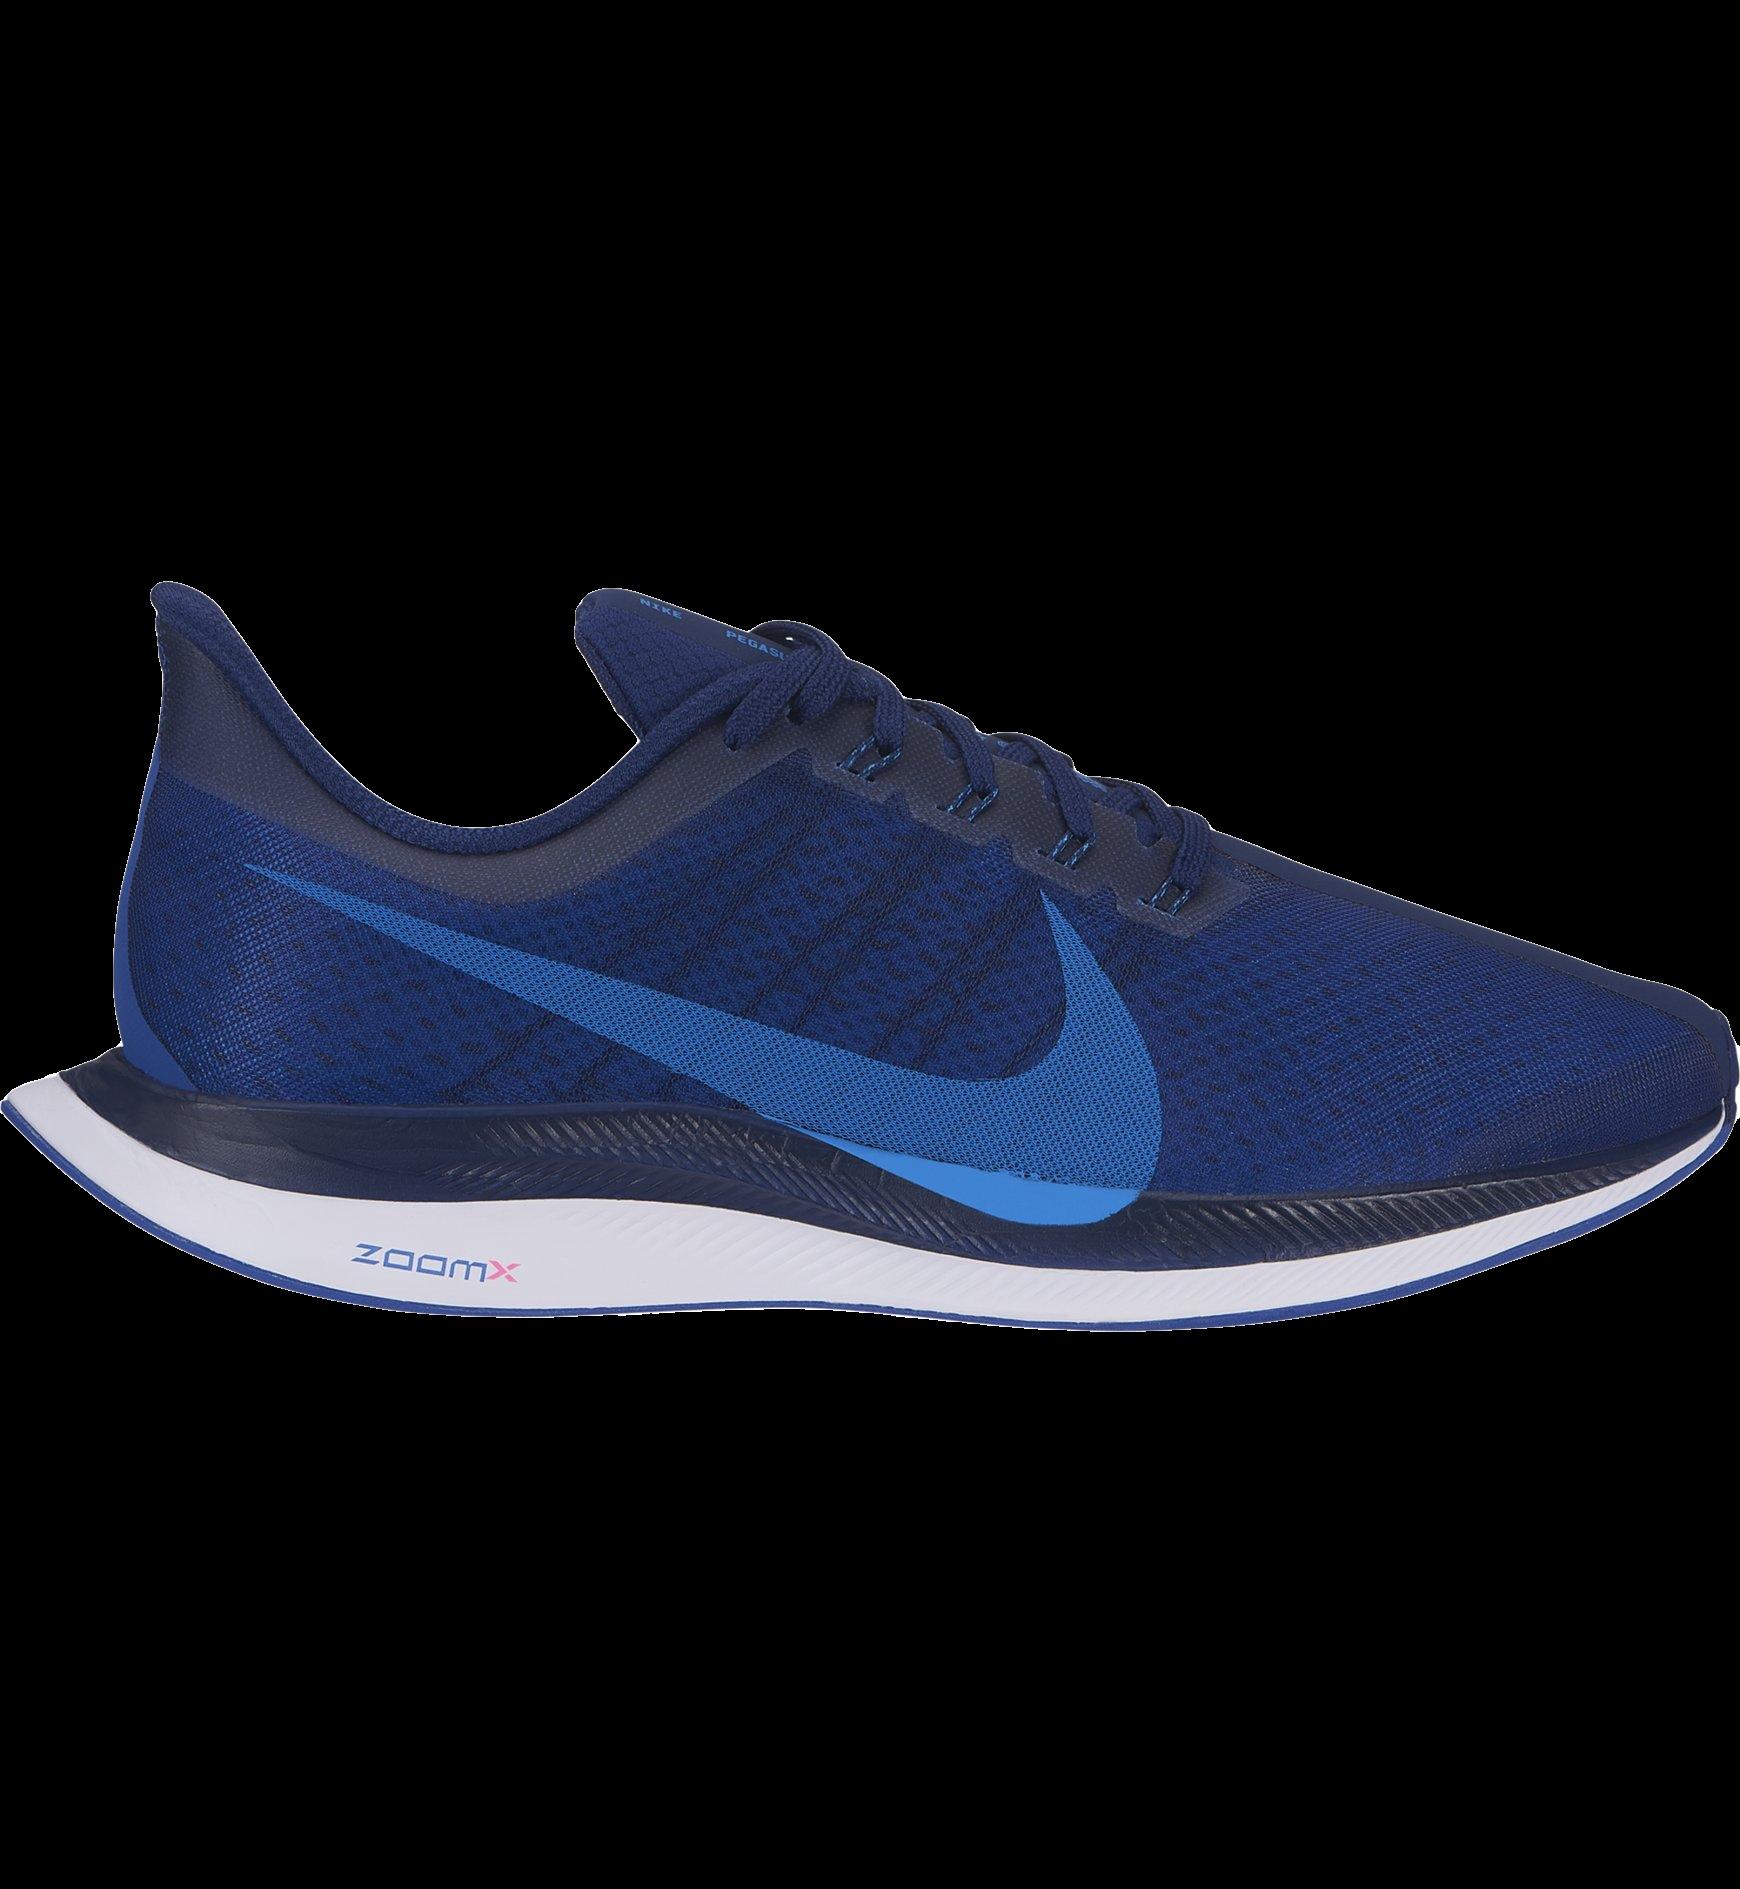 Zoom Pegasus 35 Turbo Nike Laufschuh Neutral Herrenmodell